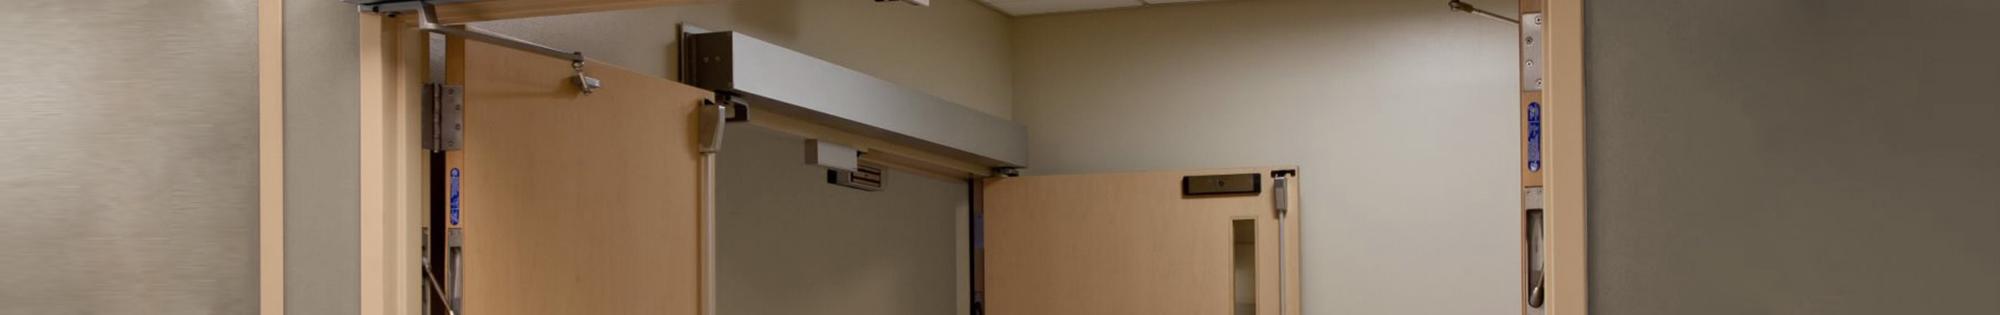 Commercial Doors & Frames